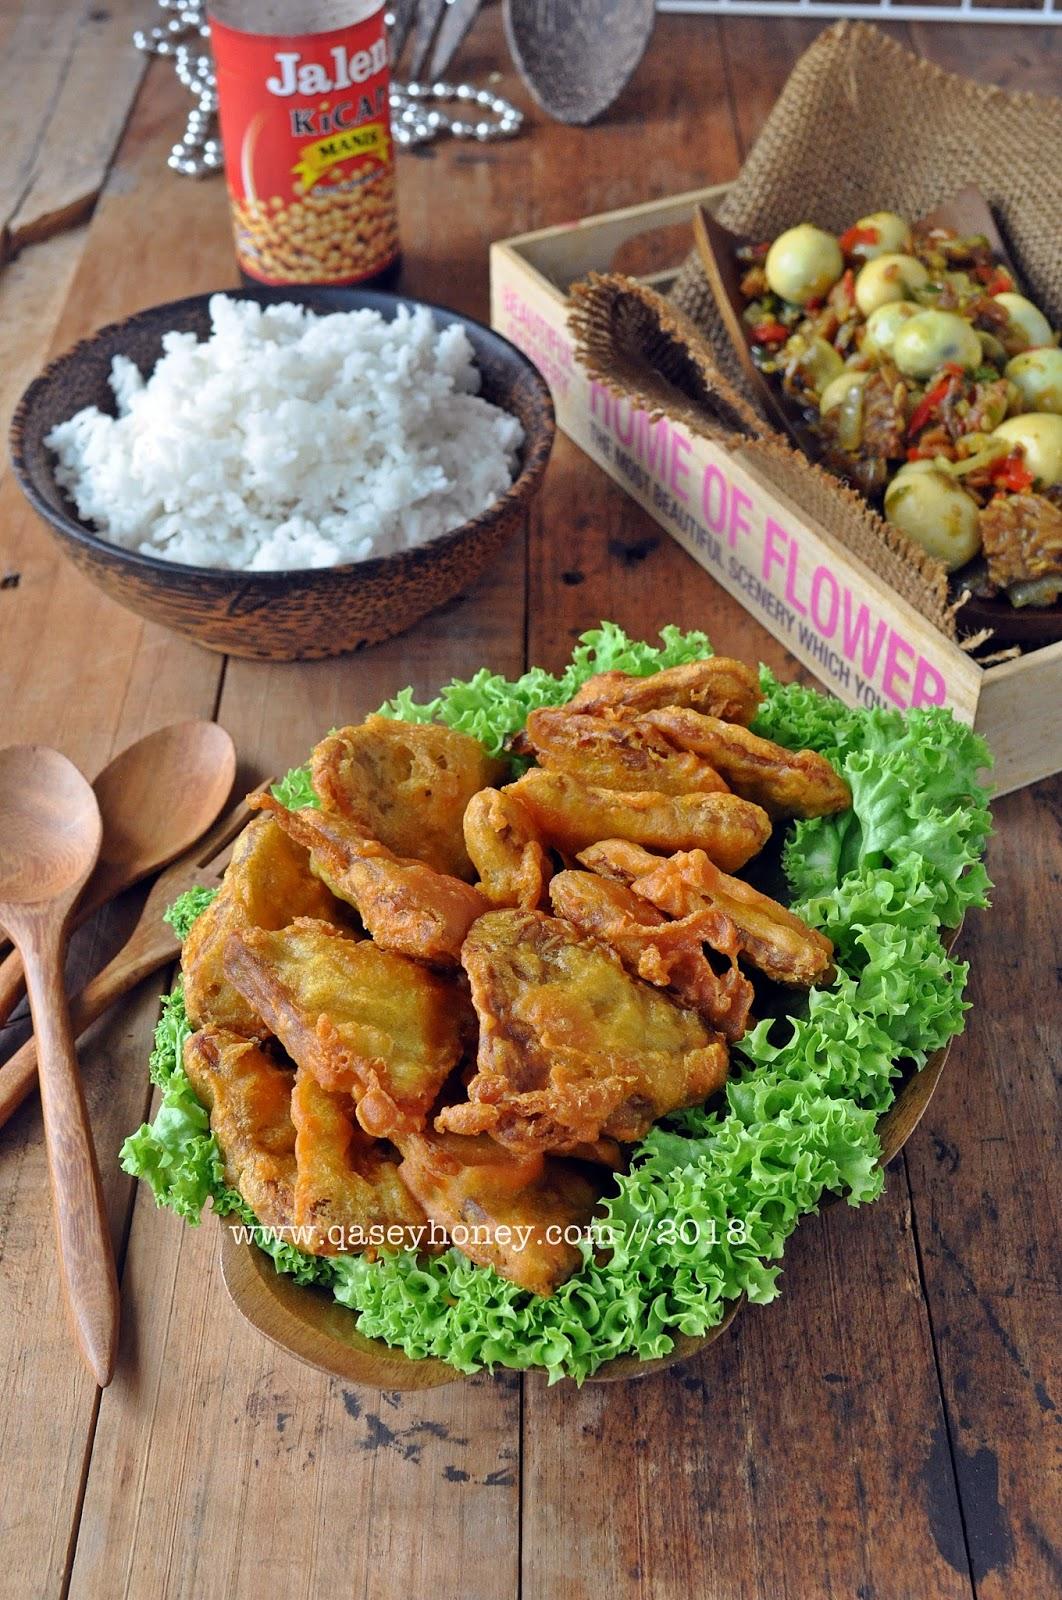 Edisi Sambal : 9 Aneka Resep Sambal Pilihan Pedas Untuk Ayam Dan Ikan Goreng/Bakar!!